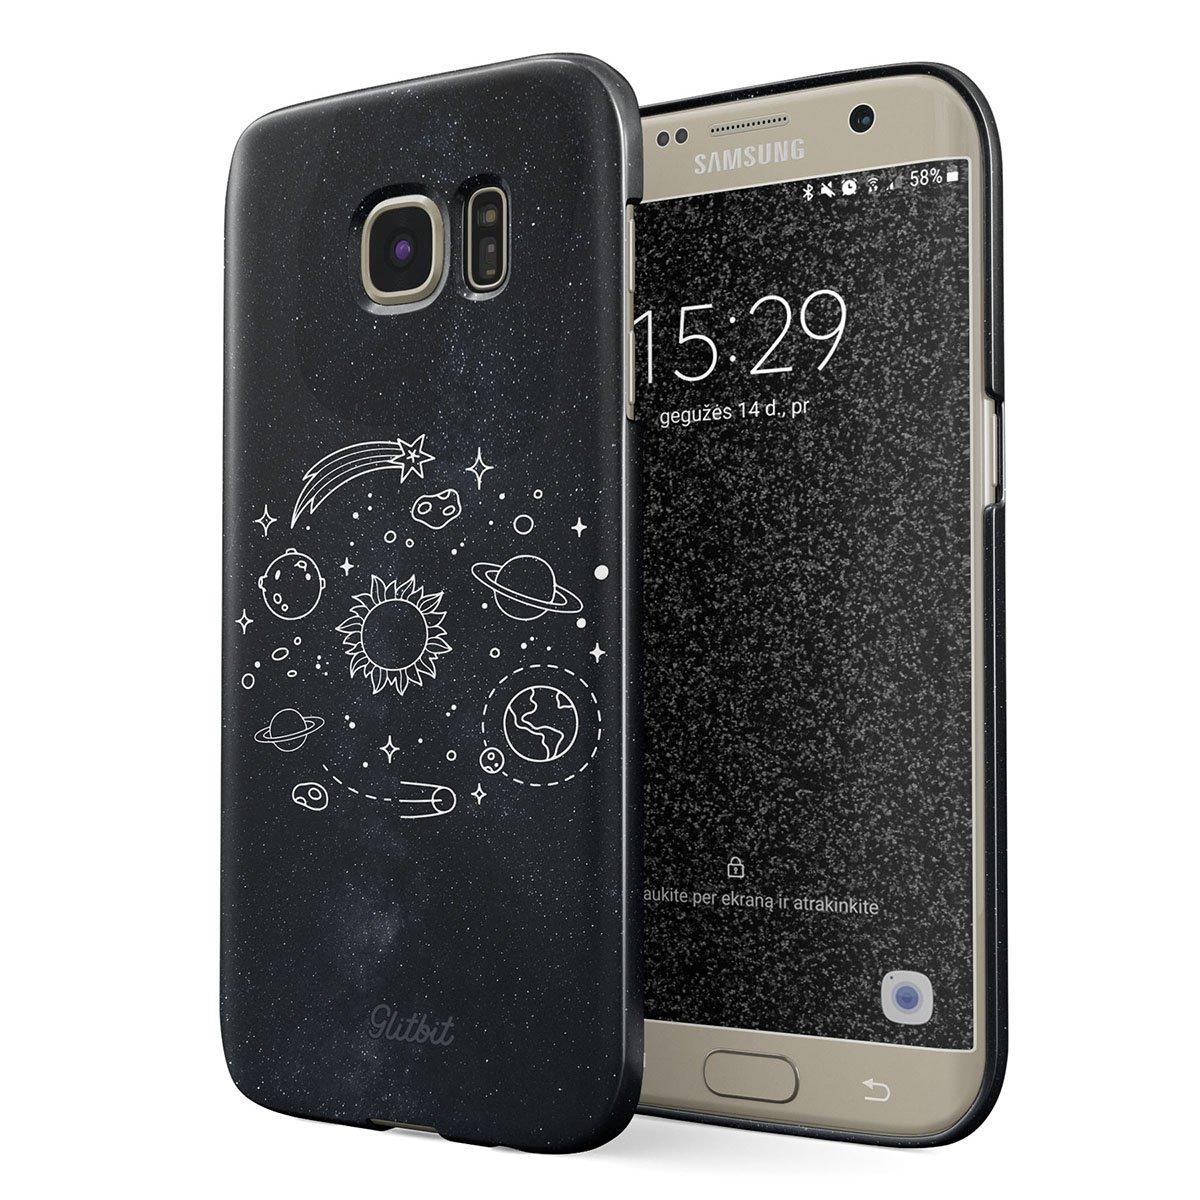 Glitbit Samsung Galaxy S7 Edge Case Cute Solar System Galaxy Stars Planet Sun Earth Moon Universe Cosmic Cosmos Space Tumblr Thin Design Durable Hard Shell Plastic Protective Case Cover